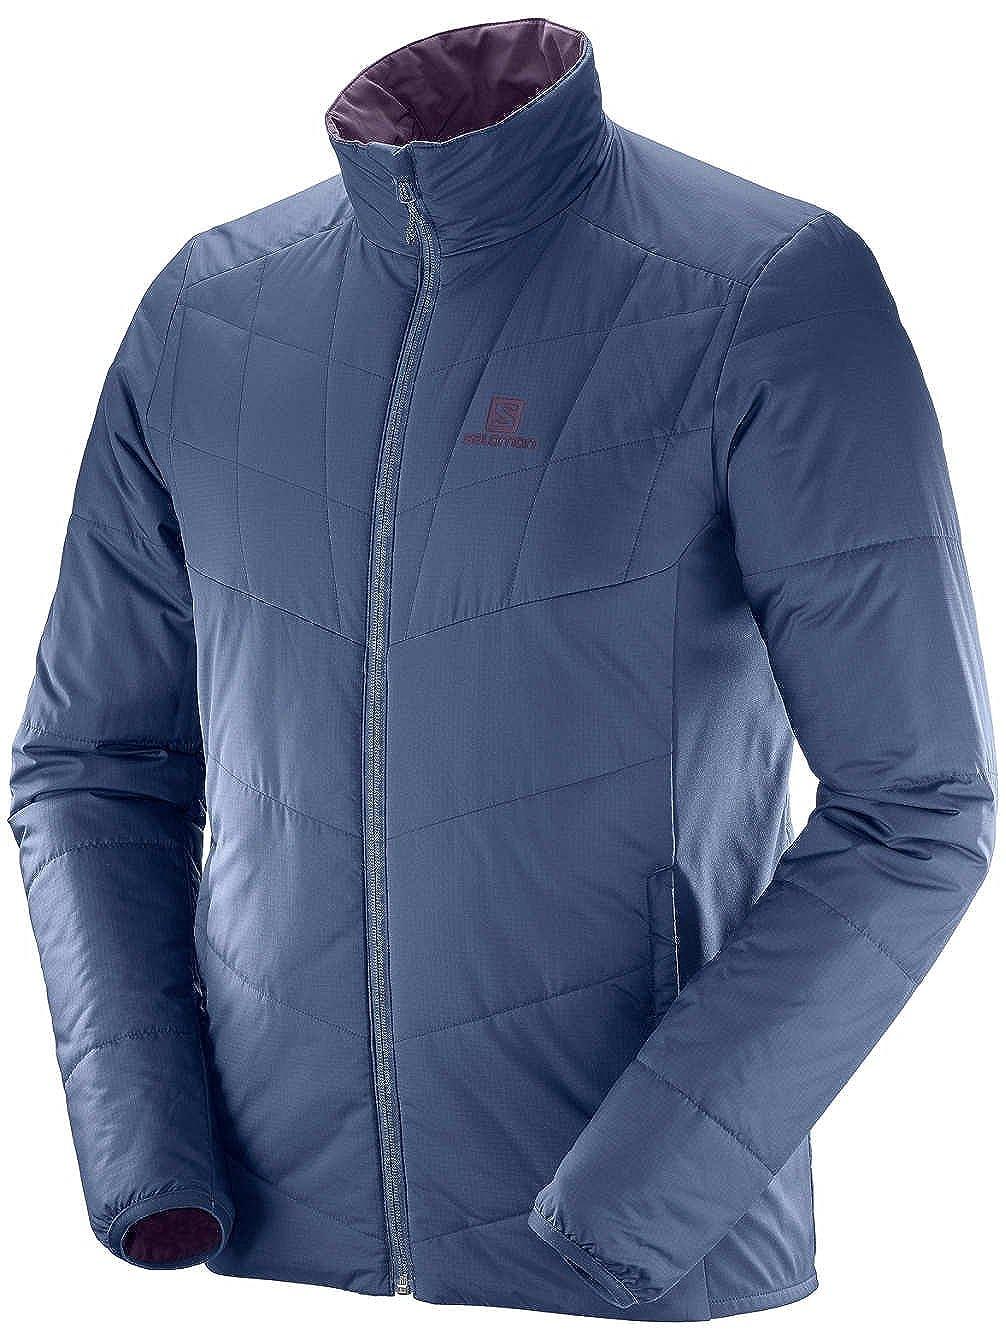 Salomon Mens Drifter Mid Jacket